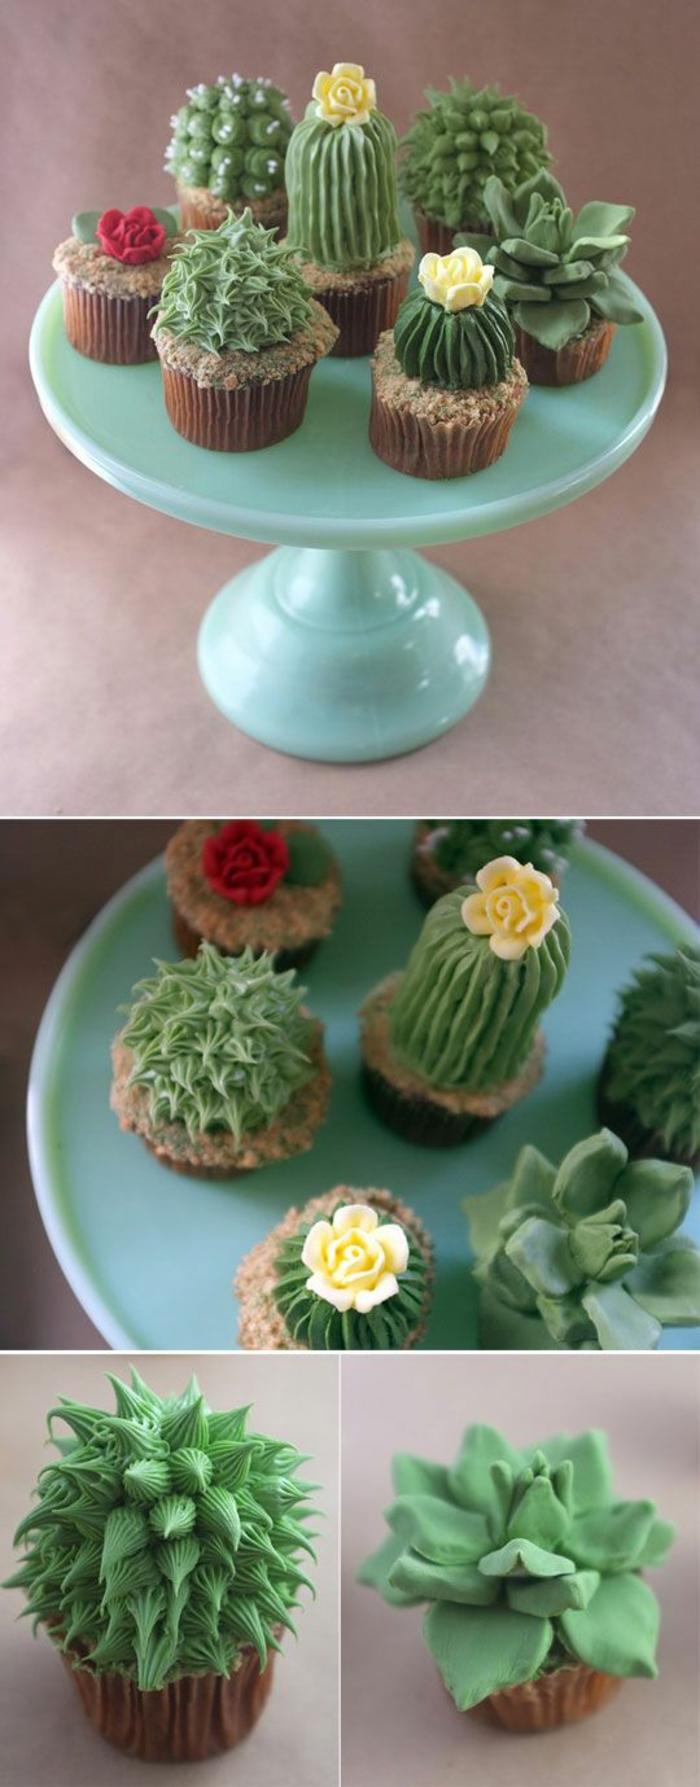 Cupcakes Rezepte Kaktus Törtchen backen für Fortgeschrittene